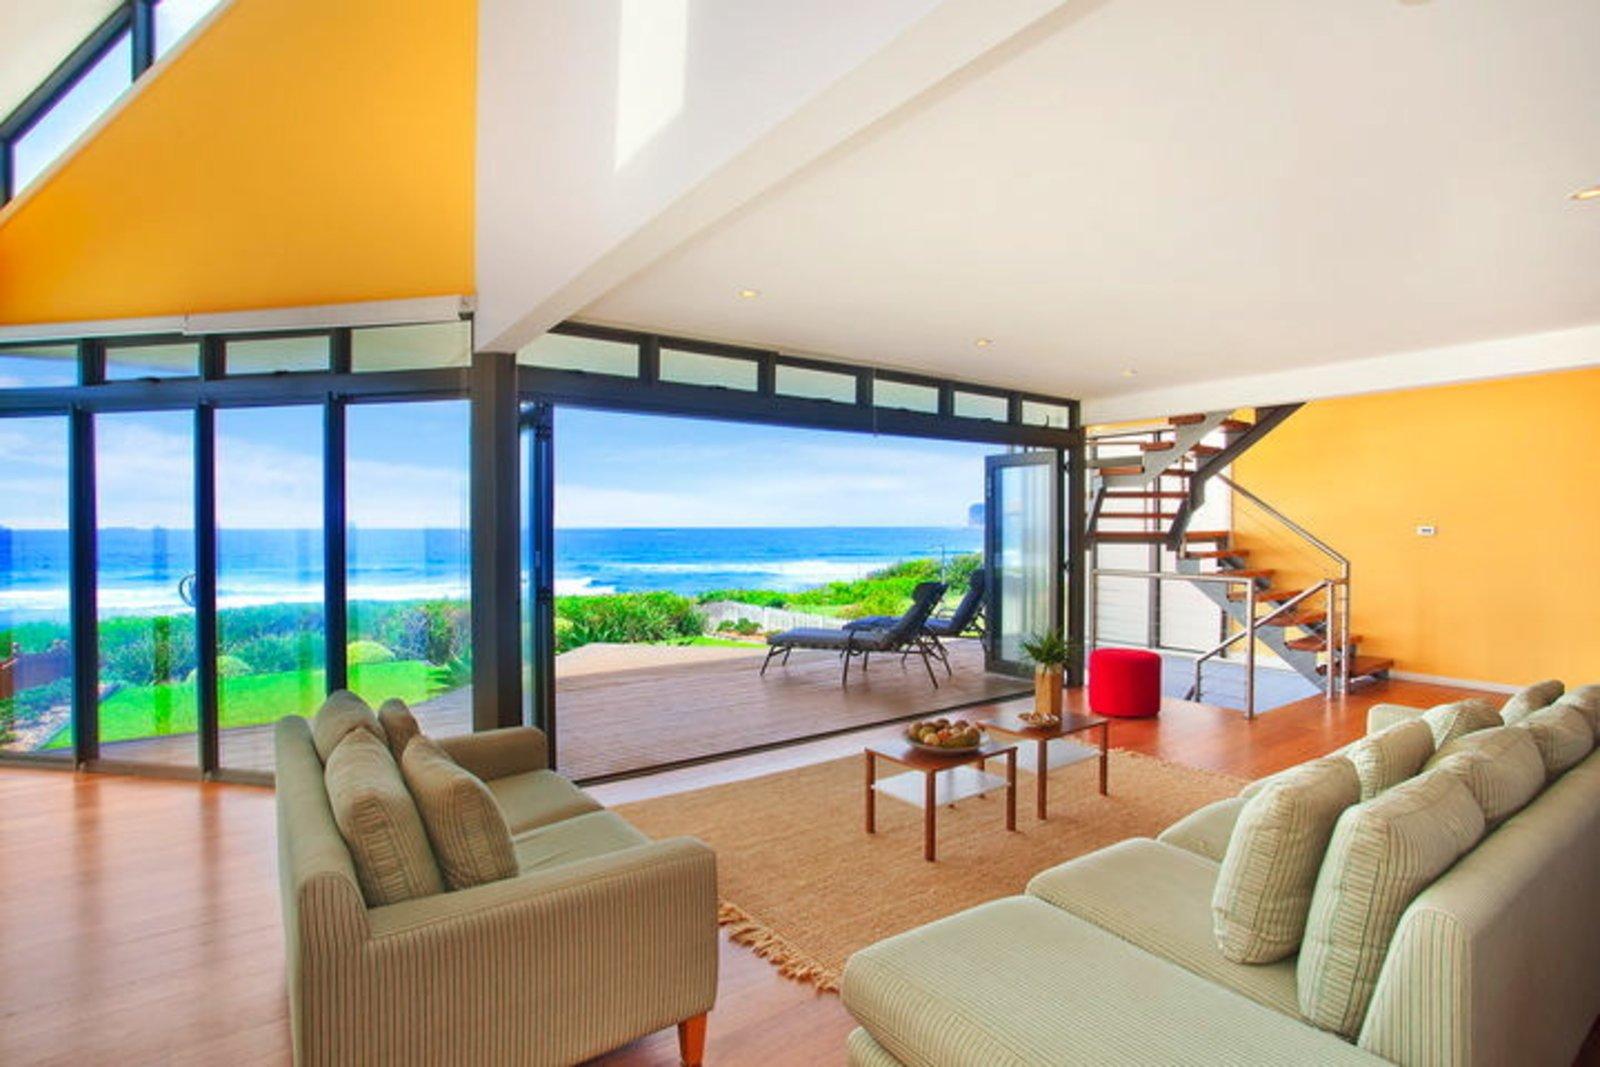 Multi-Hued Beach Escape Near Sydney (North Avoca, Australia)  Photo 5 of 16 in 15 Modern Summer Rentals